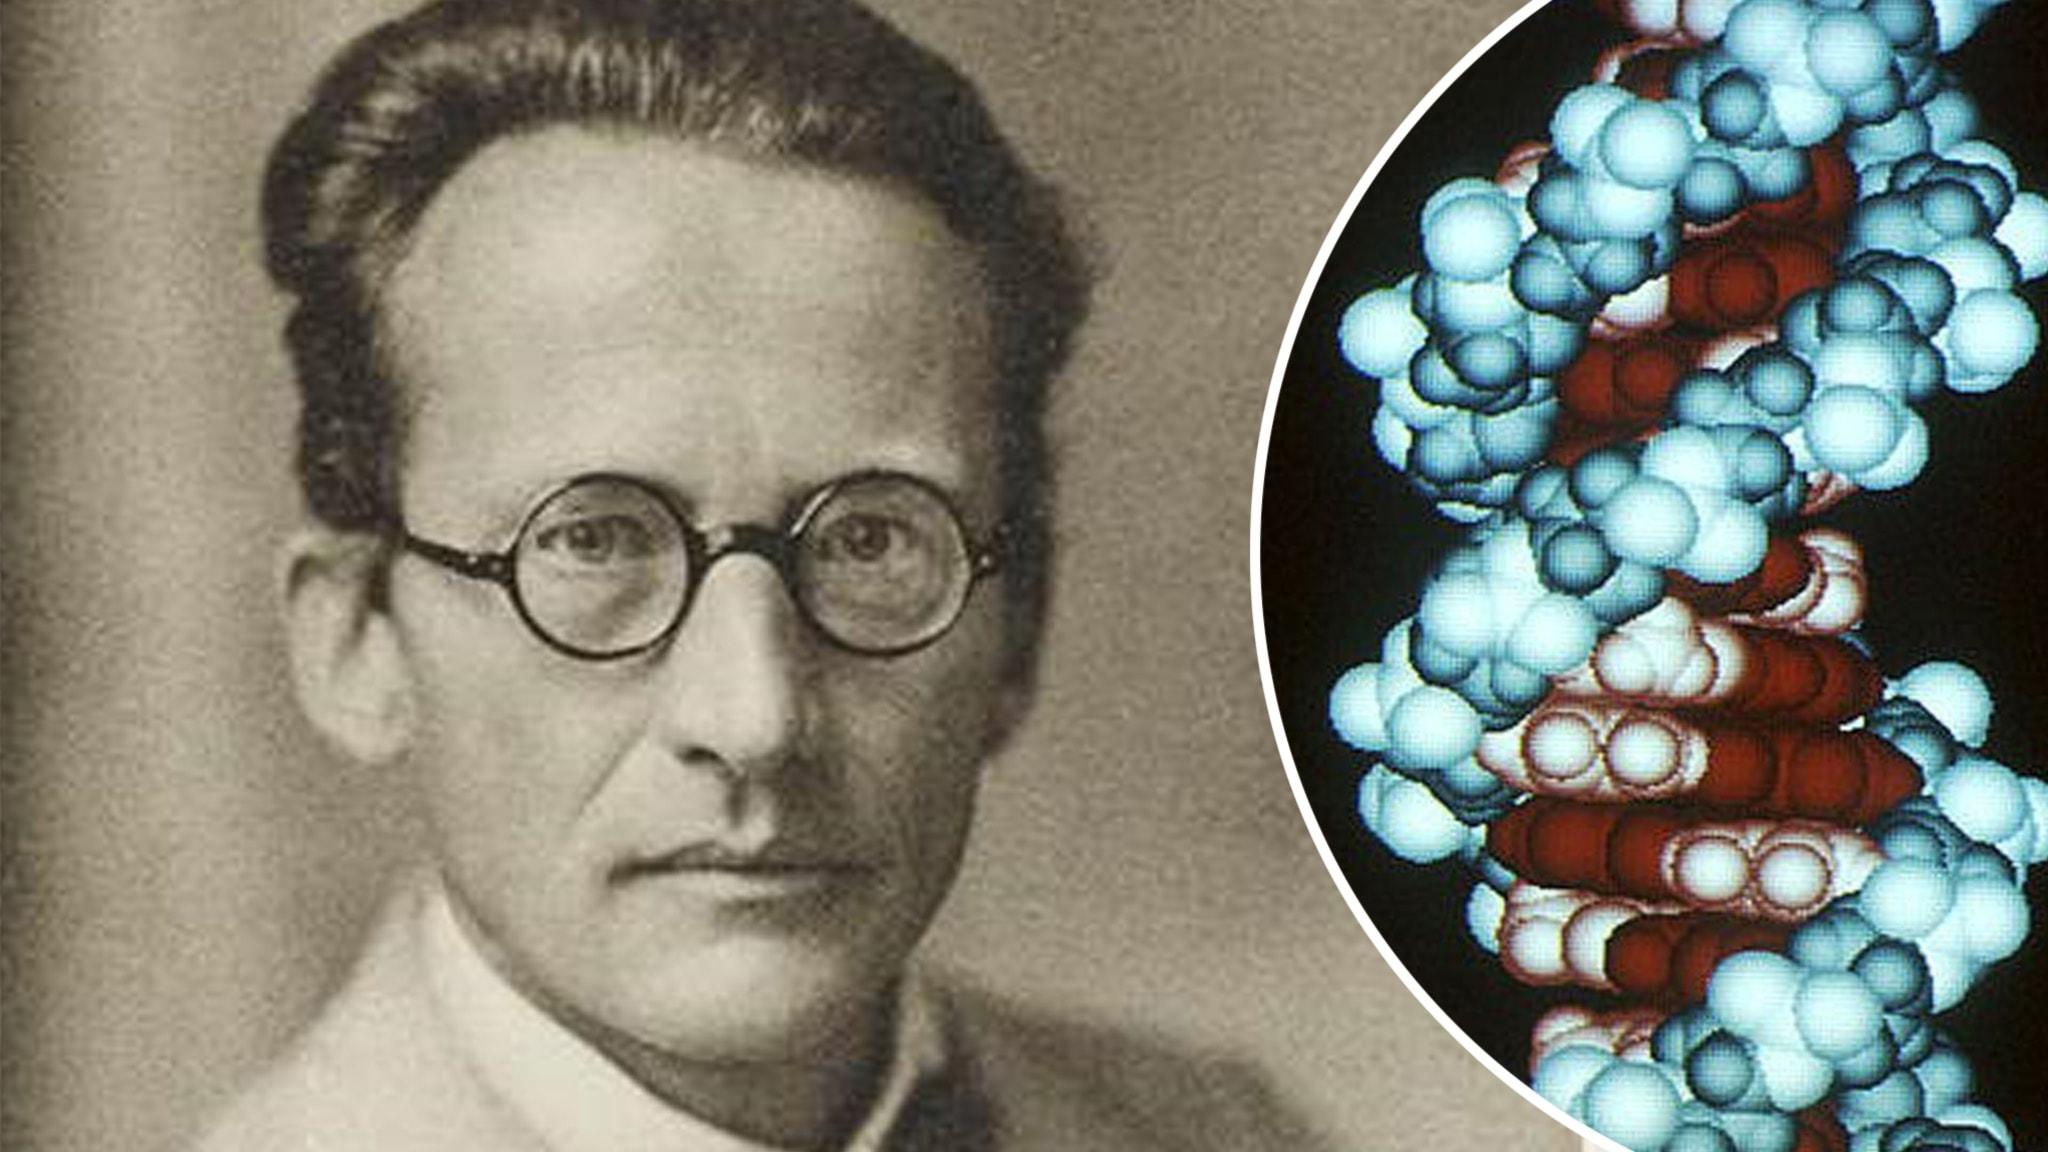 Fysikern Schrödinger väckte biologins ödesfrågor (R)